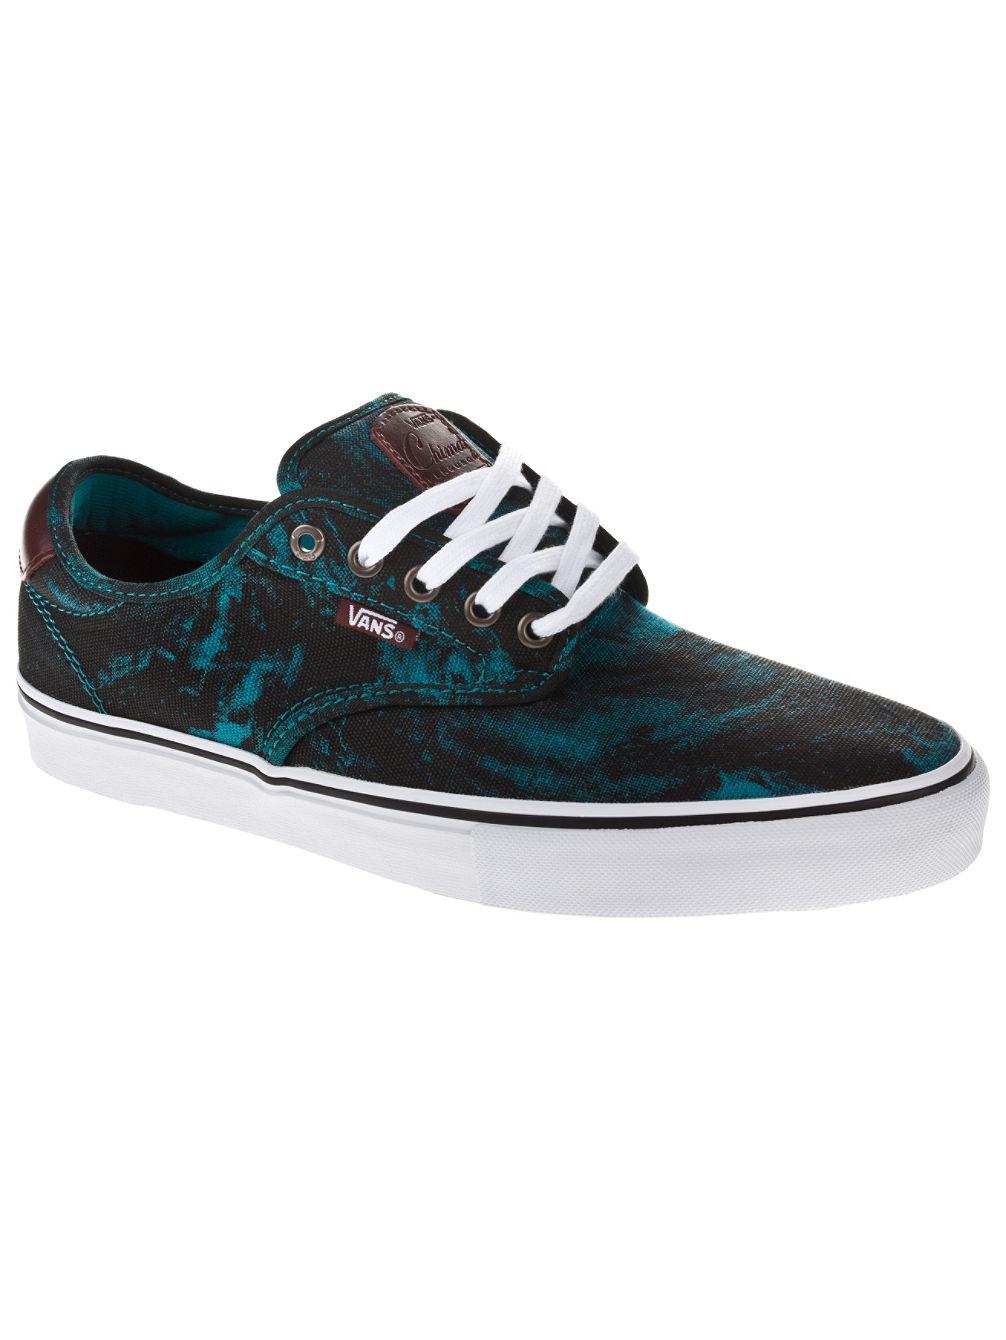 Chima+Ferguson+Skate+Shoes+jpg.jpg?$b8